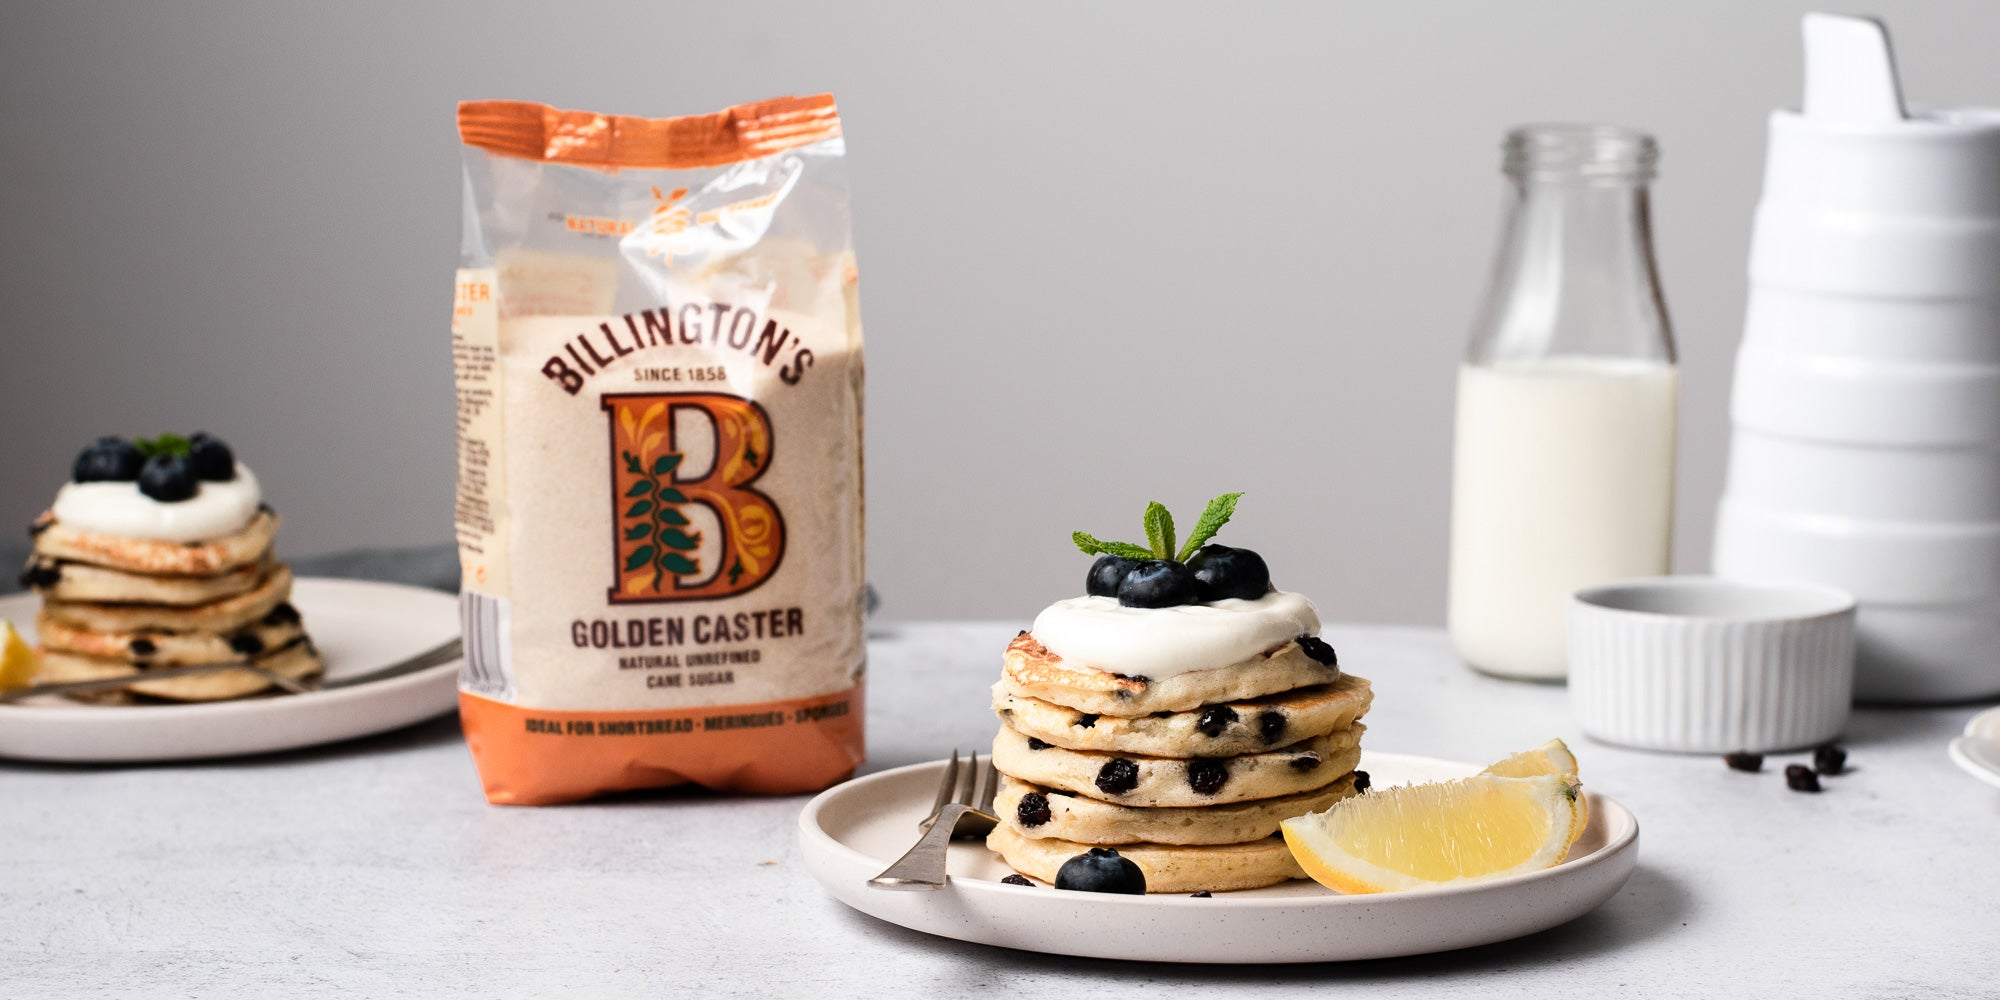 Lemon and Raisin Pancakes stacked